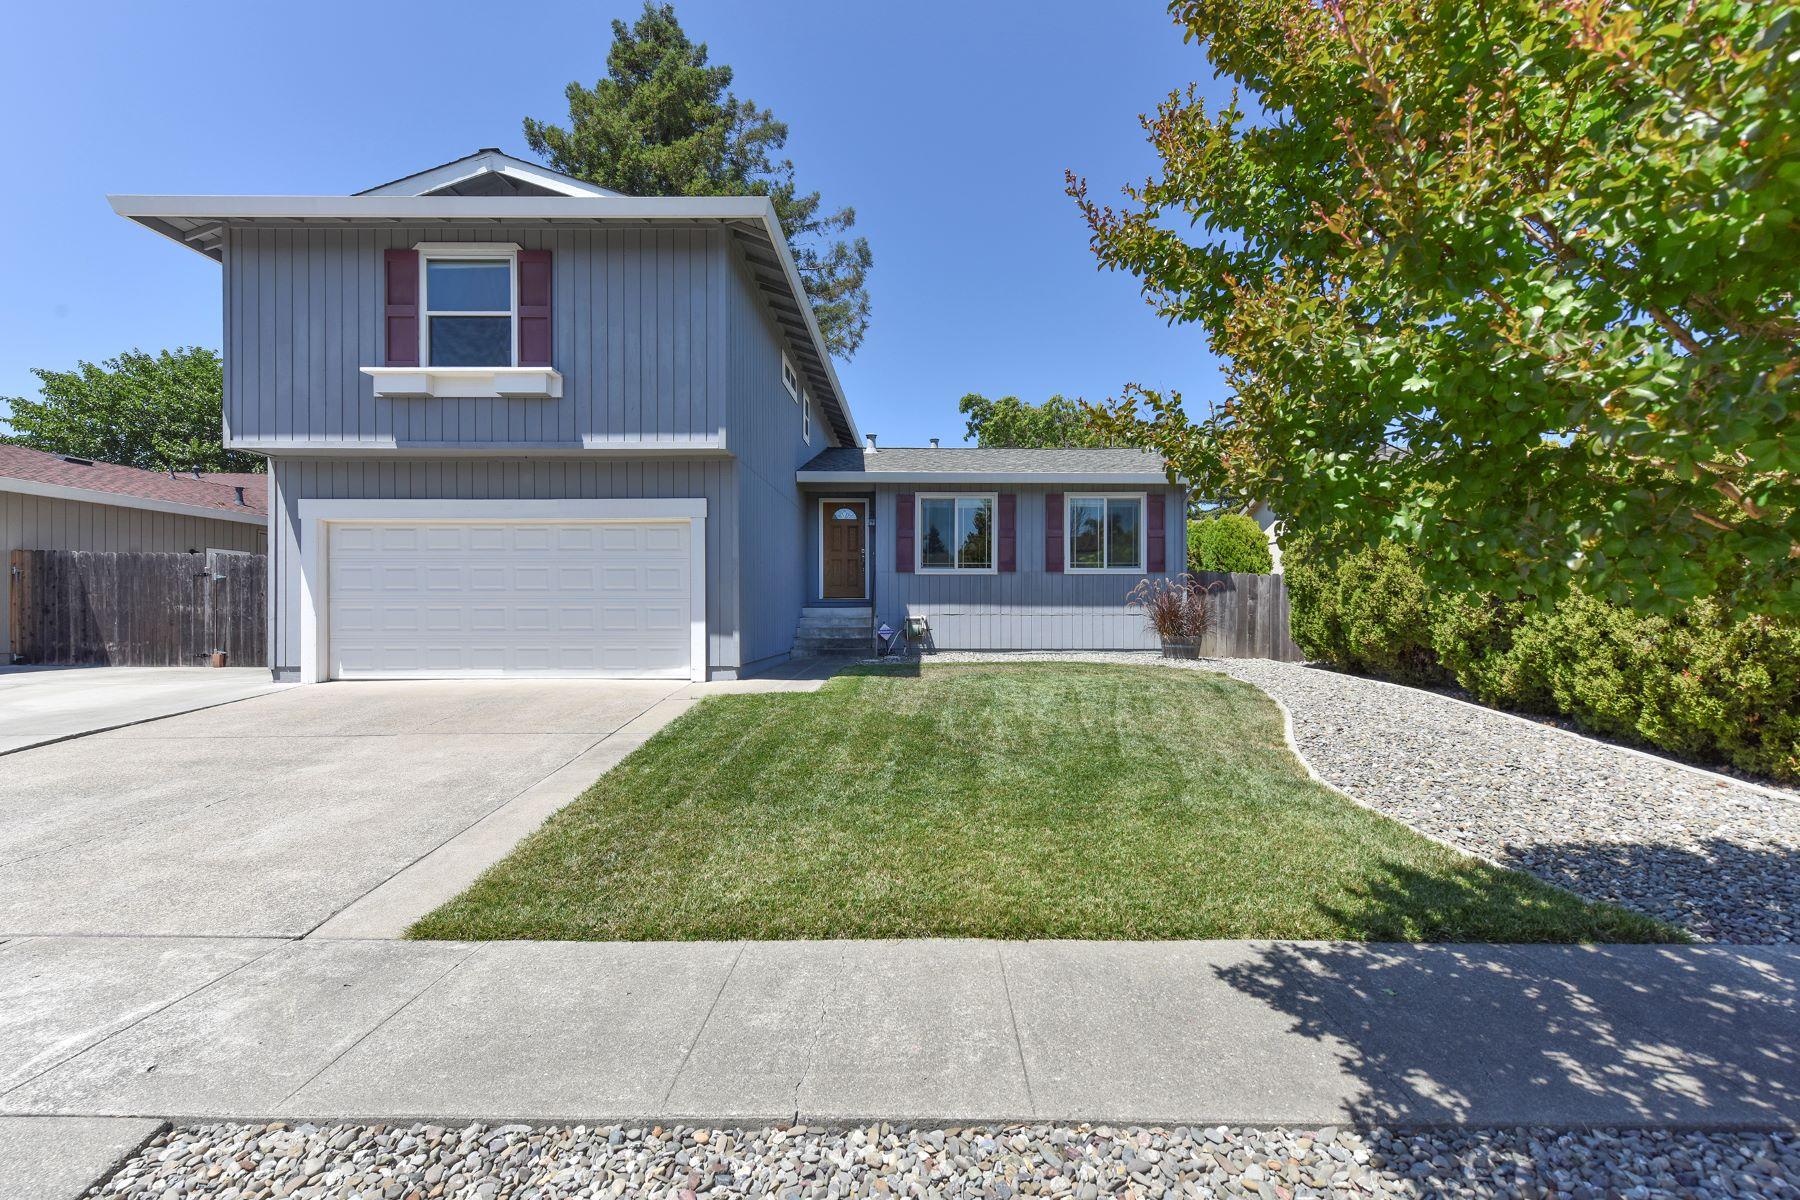 独户住宅 为 销售 在 Great Central Location in Established Neighborhood 736 Joseph court 纳帕, 加利福尼亚州, 94558 美国